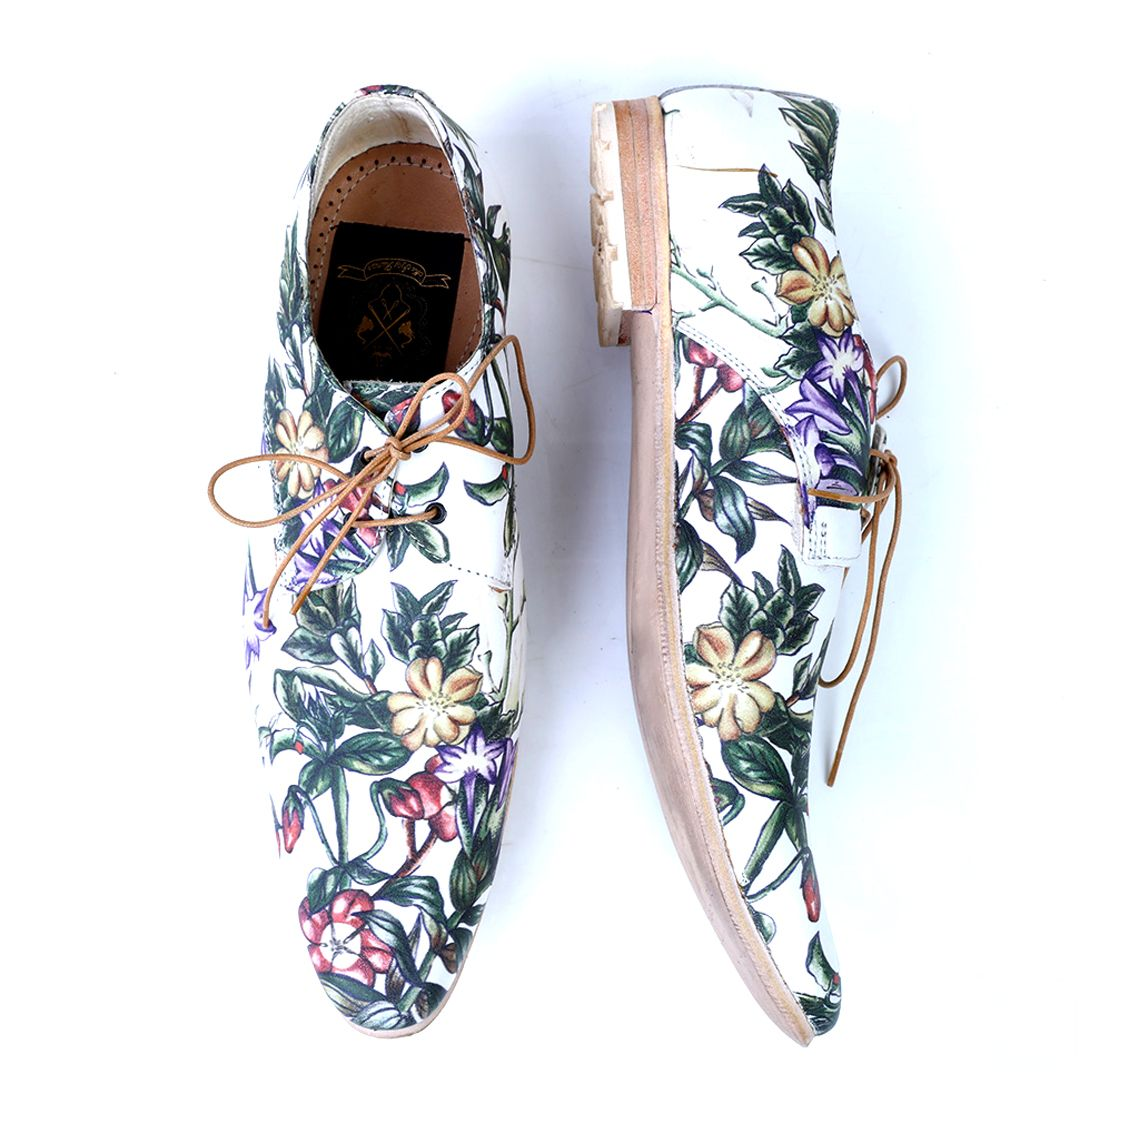 Bodh Handmade Leather Printed Shoes